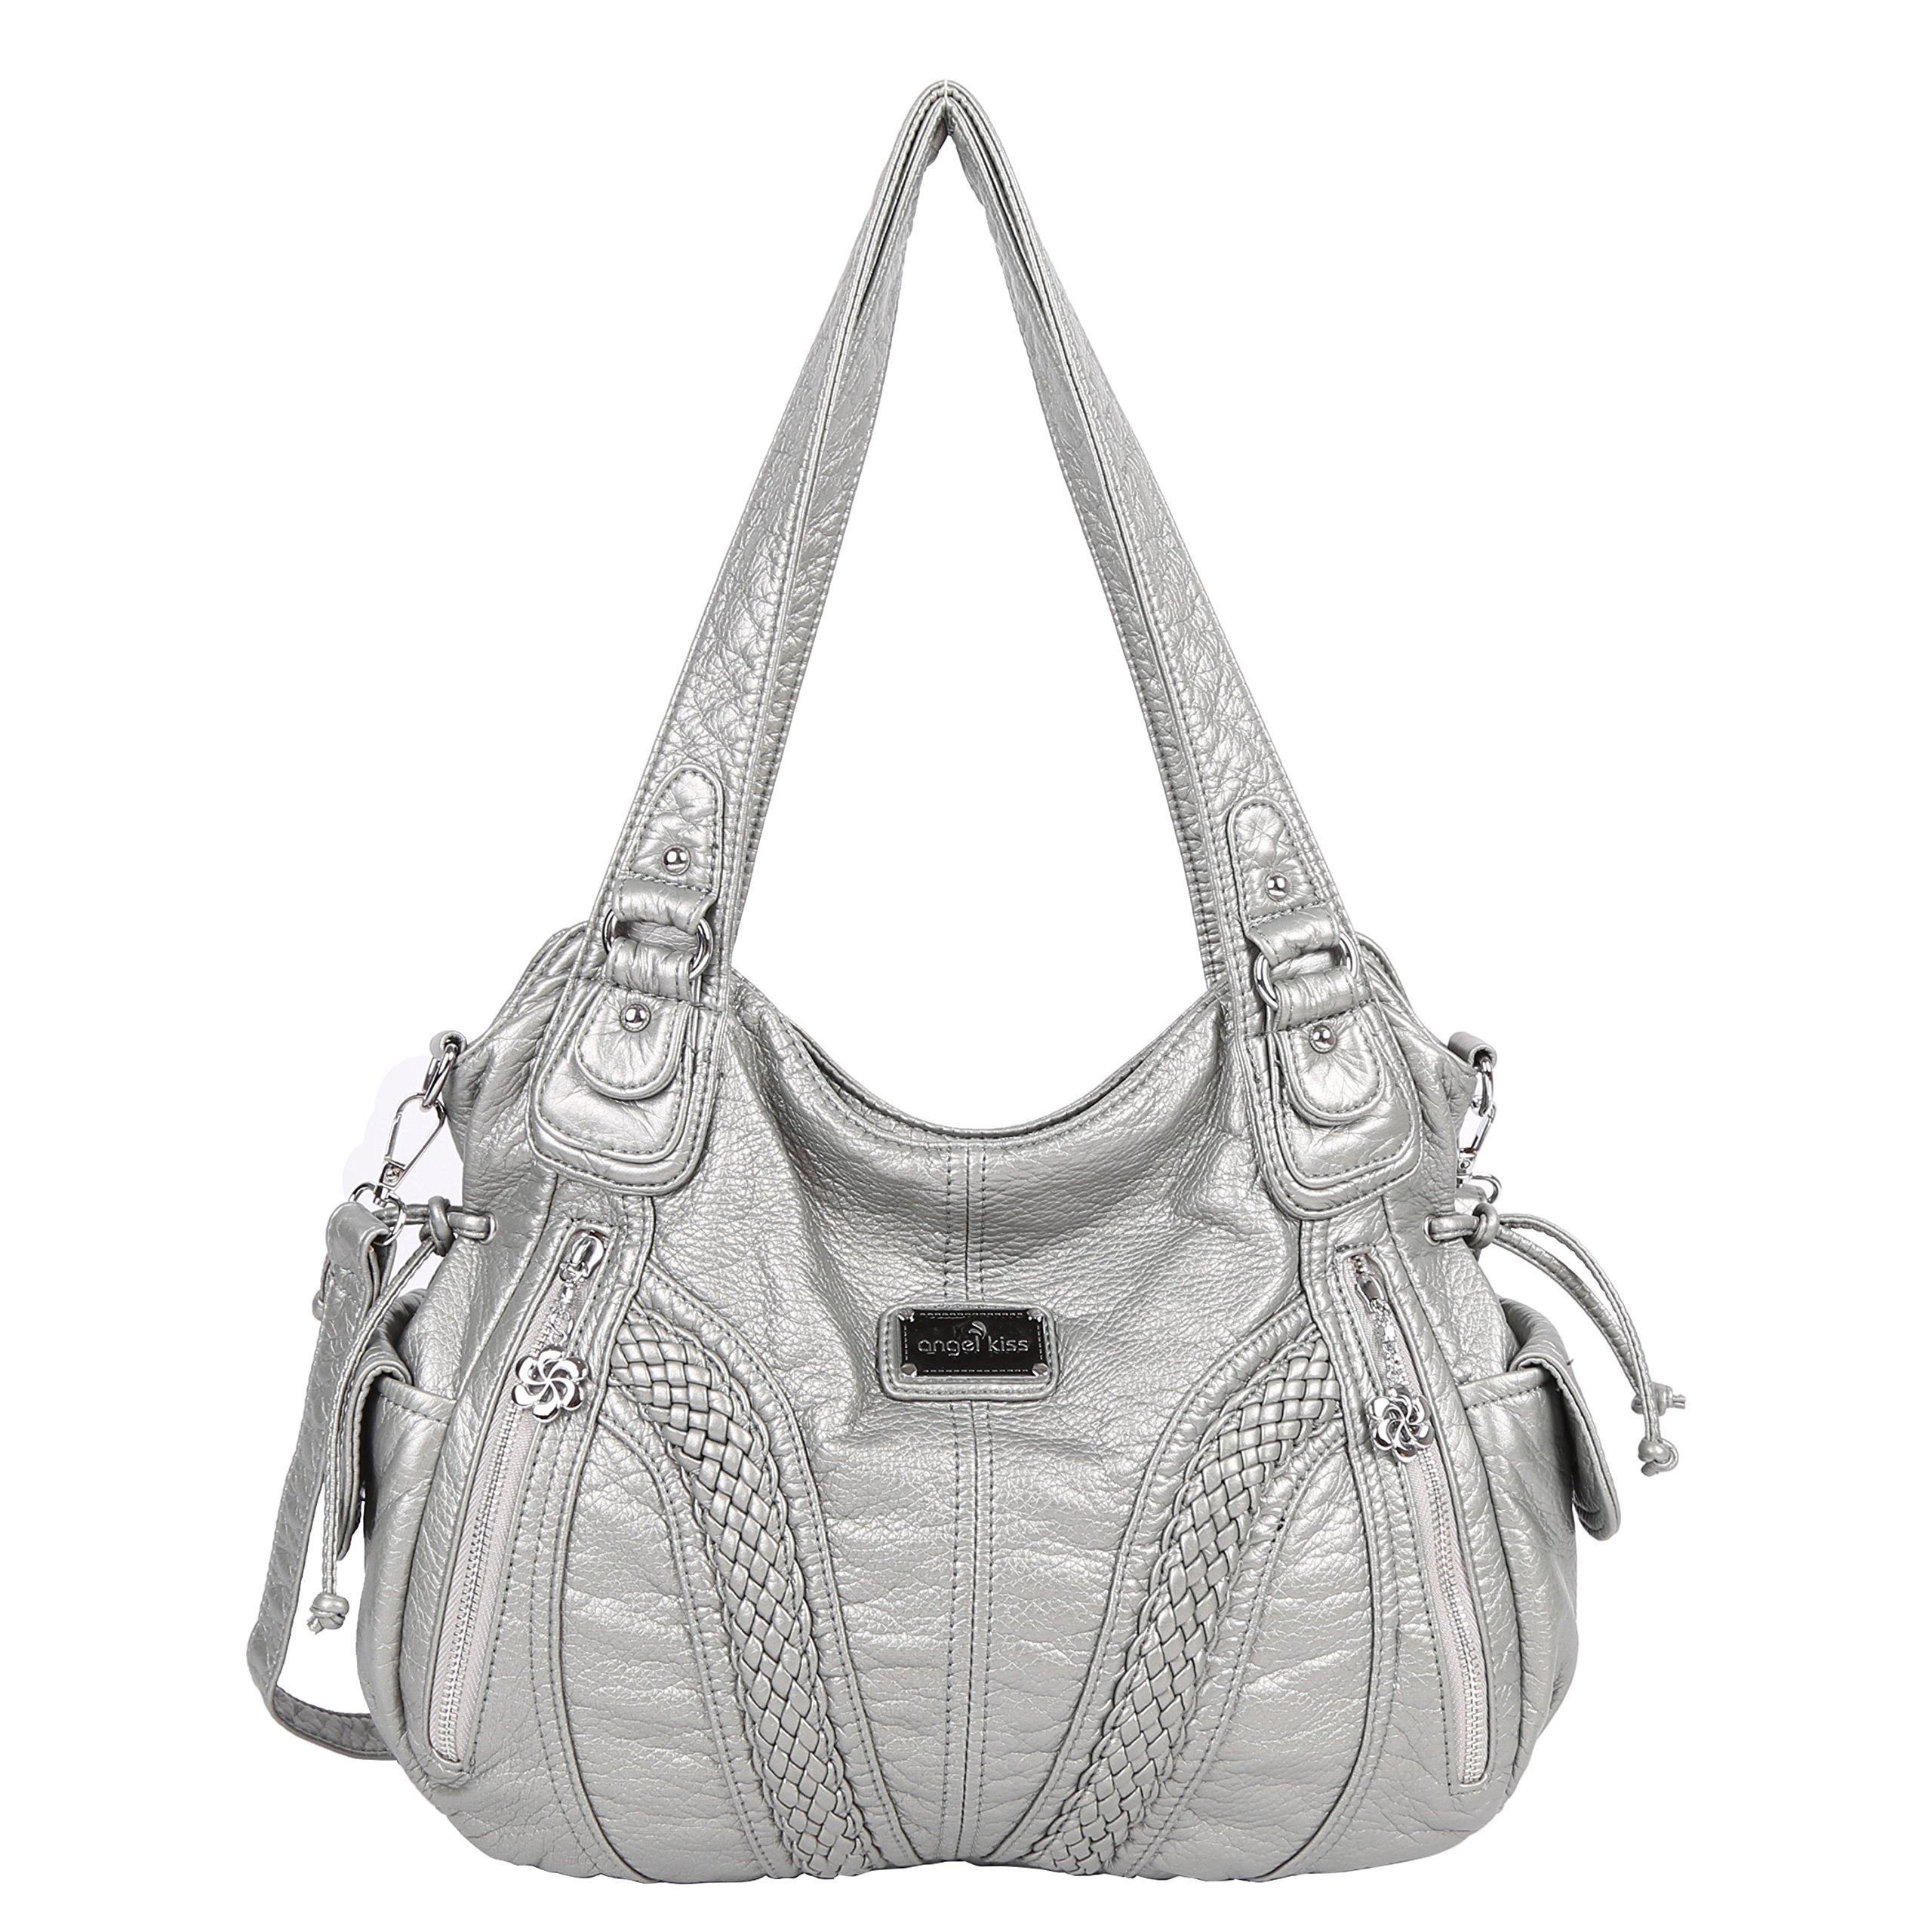 Angelkiss Women Top Handle Satchel Handbags Shoulder Bag Messenger Tote  Washed Leather Purses Bag … 07a4f003f7